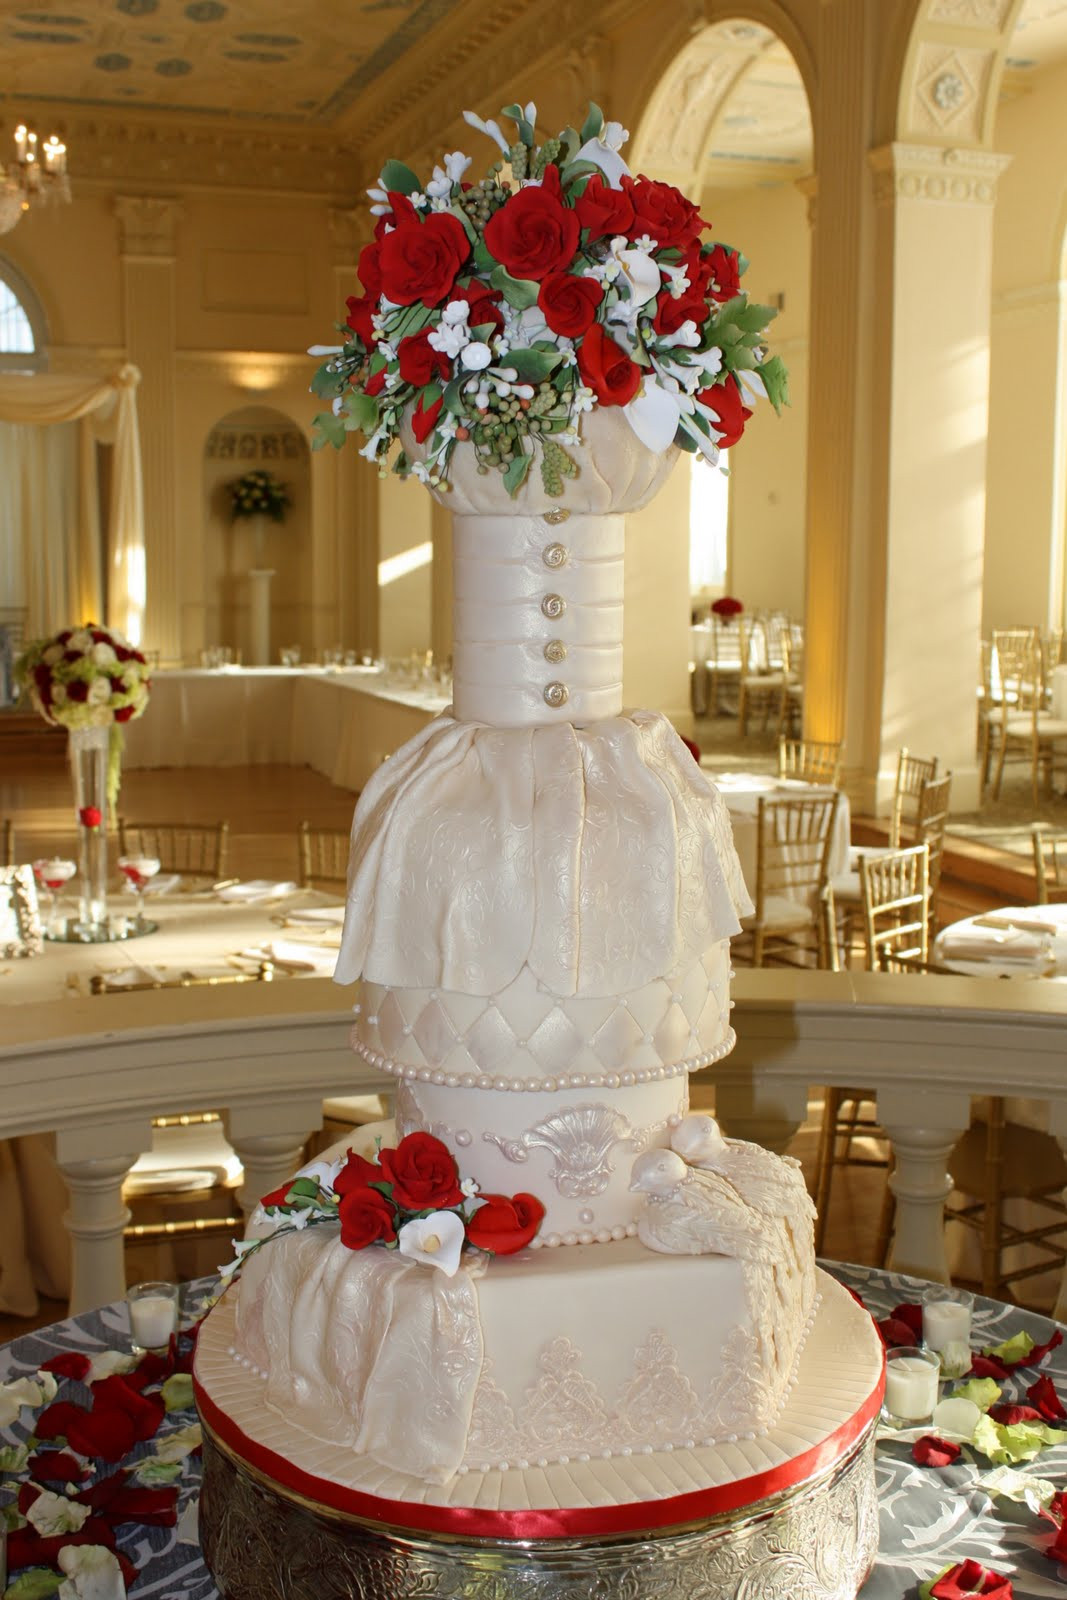 Wedding Cakes Atlanta Ga  Cakes by La'Meeka Atlanta Wedding Cakes